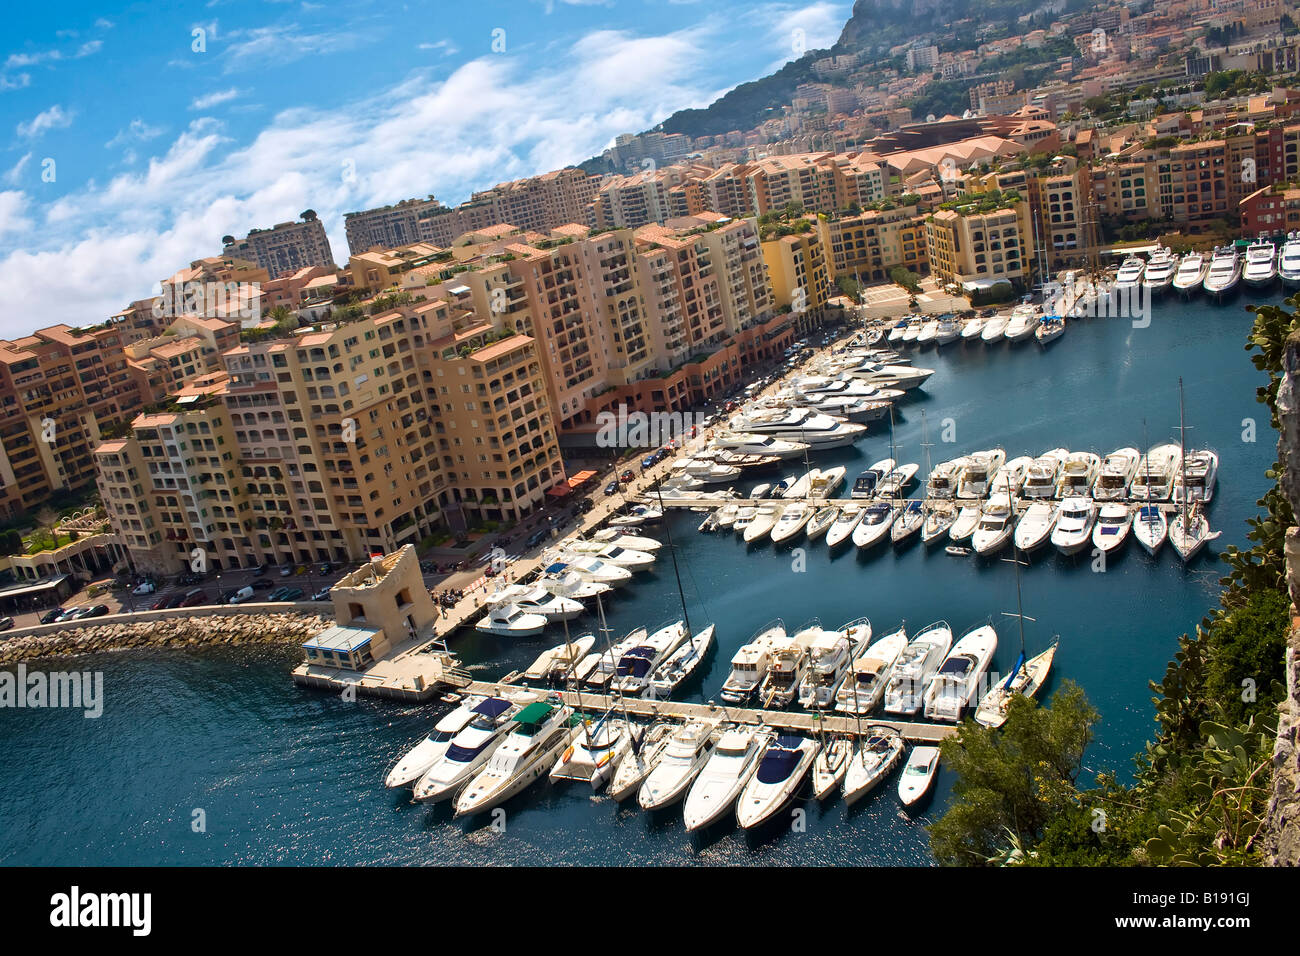 MONACO, MONTE CARLO. Fontvieille. Luxury bay in Monte Carlo Principality Monaco Europe - Stock Image